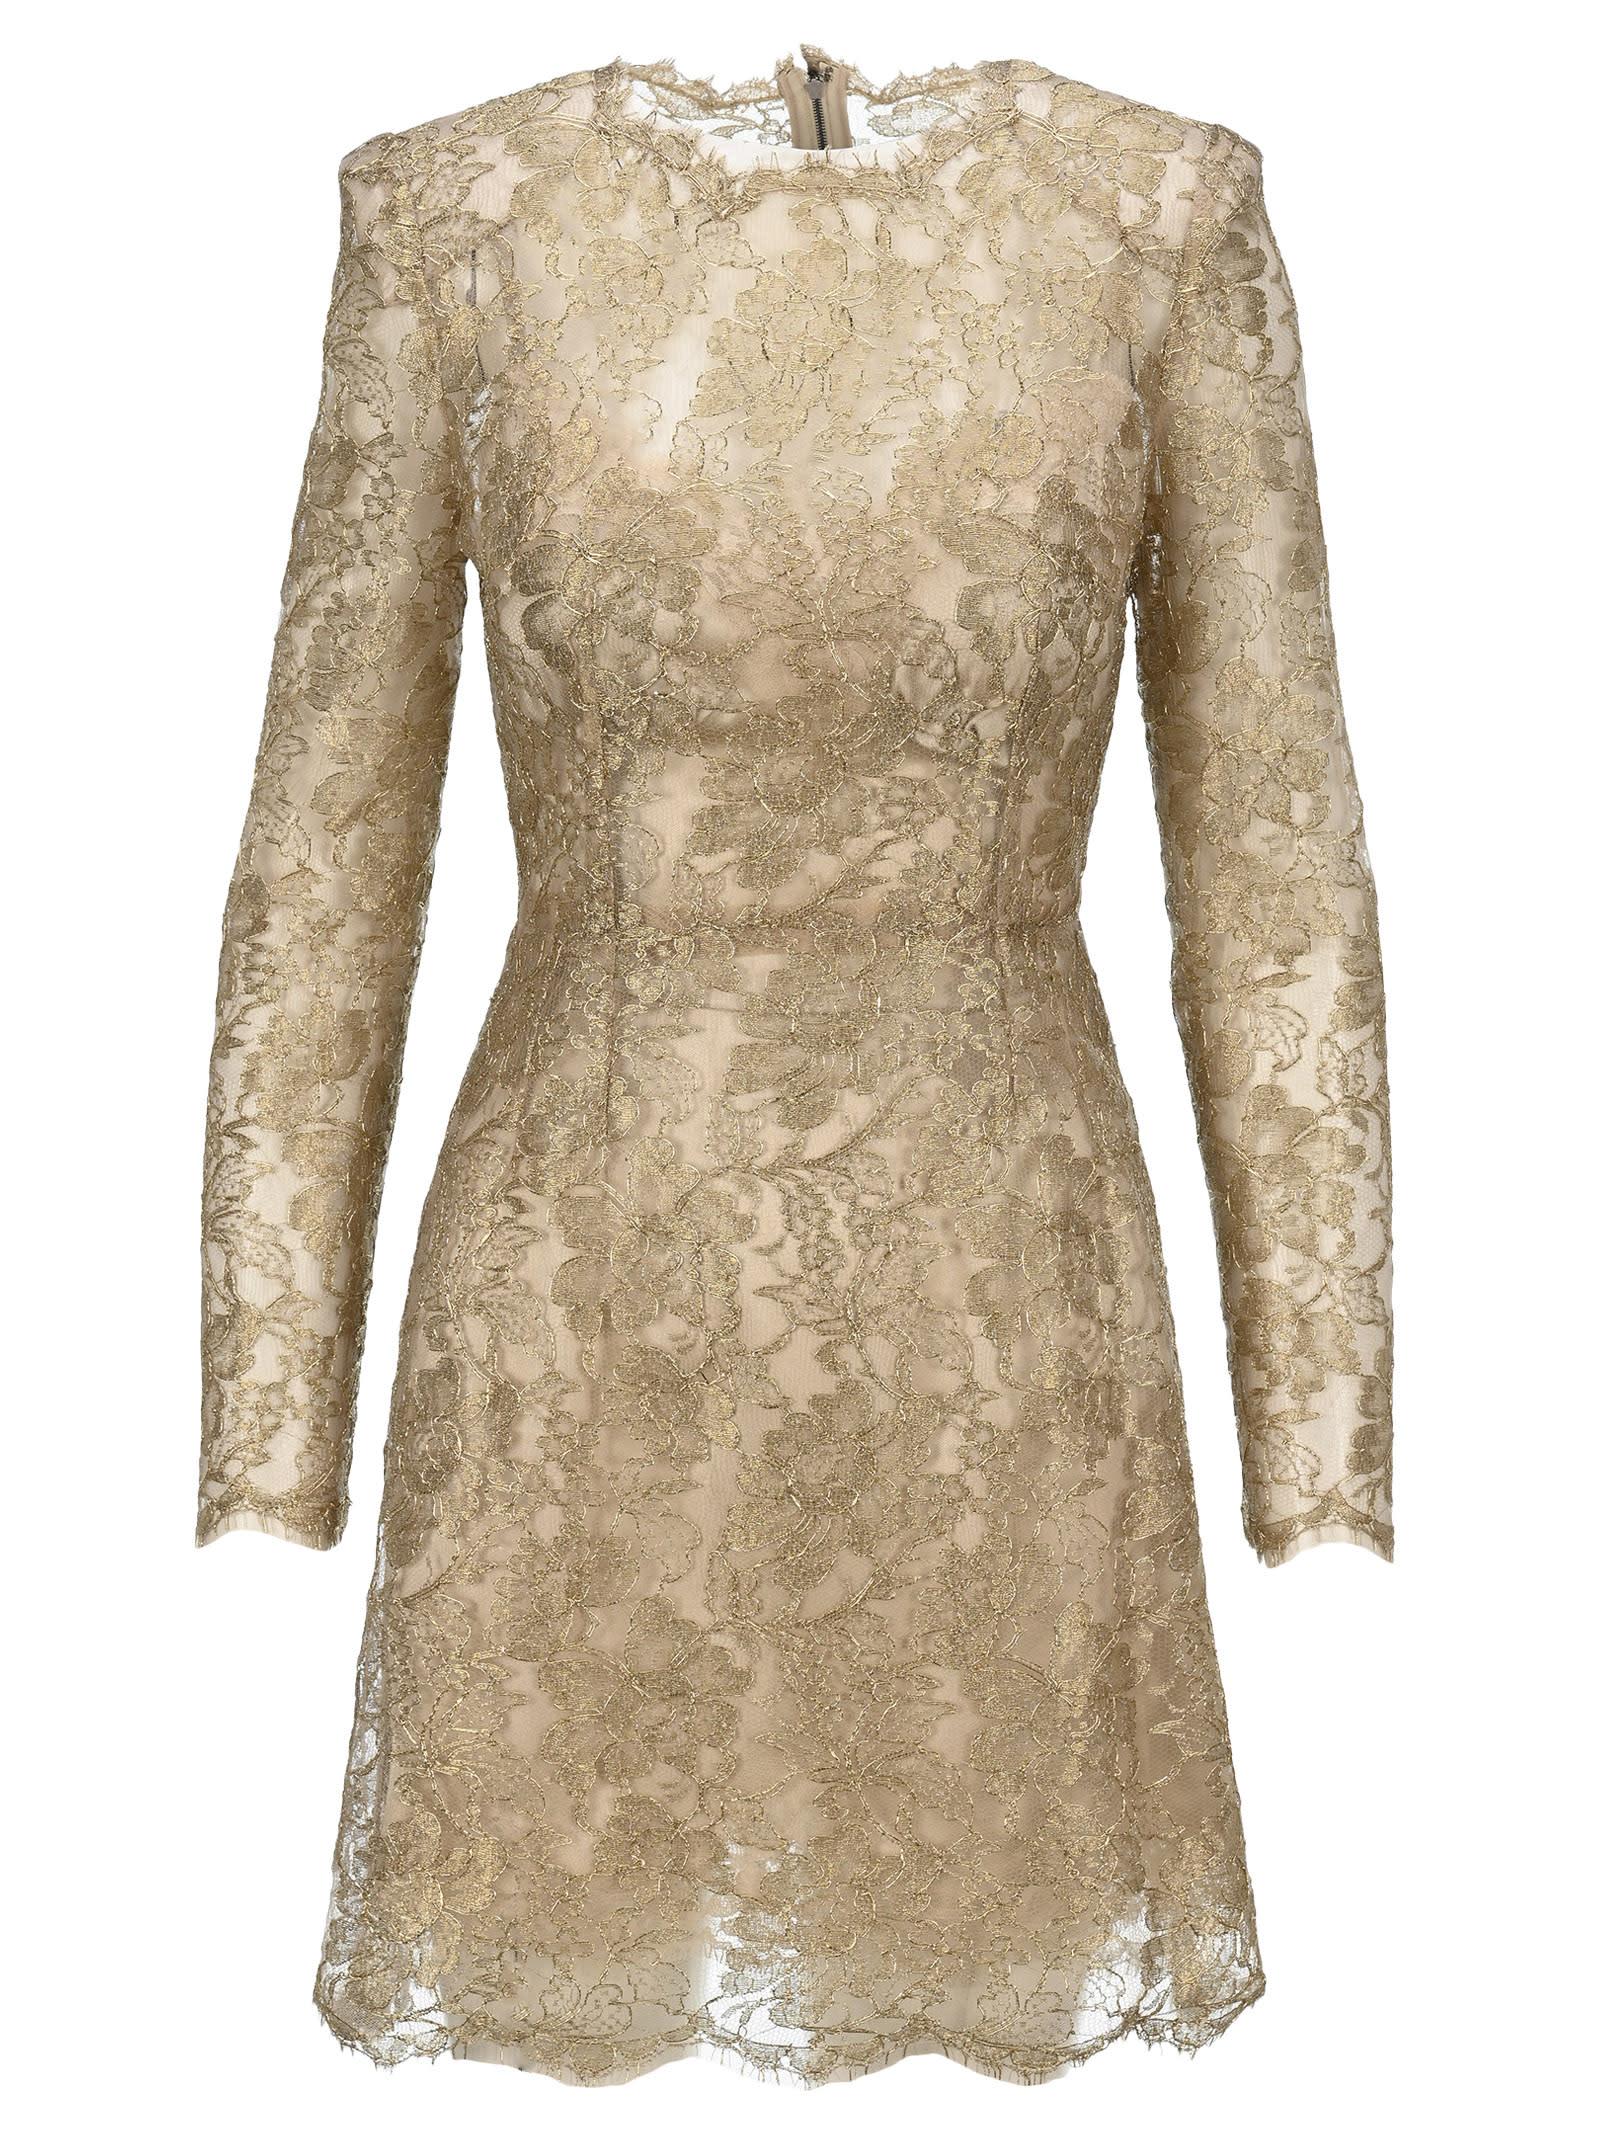 Buy Dolce & Gabbana Dolce & gabbana Floral Lace Dress online, shop Dolce & Gabbana with free shipping